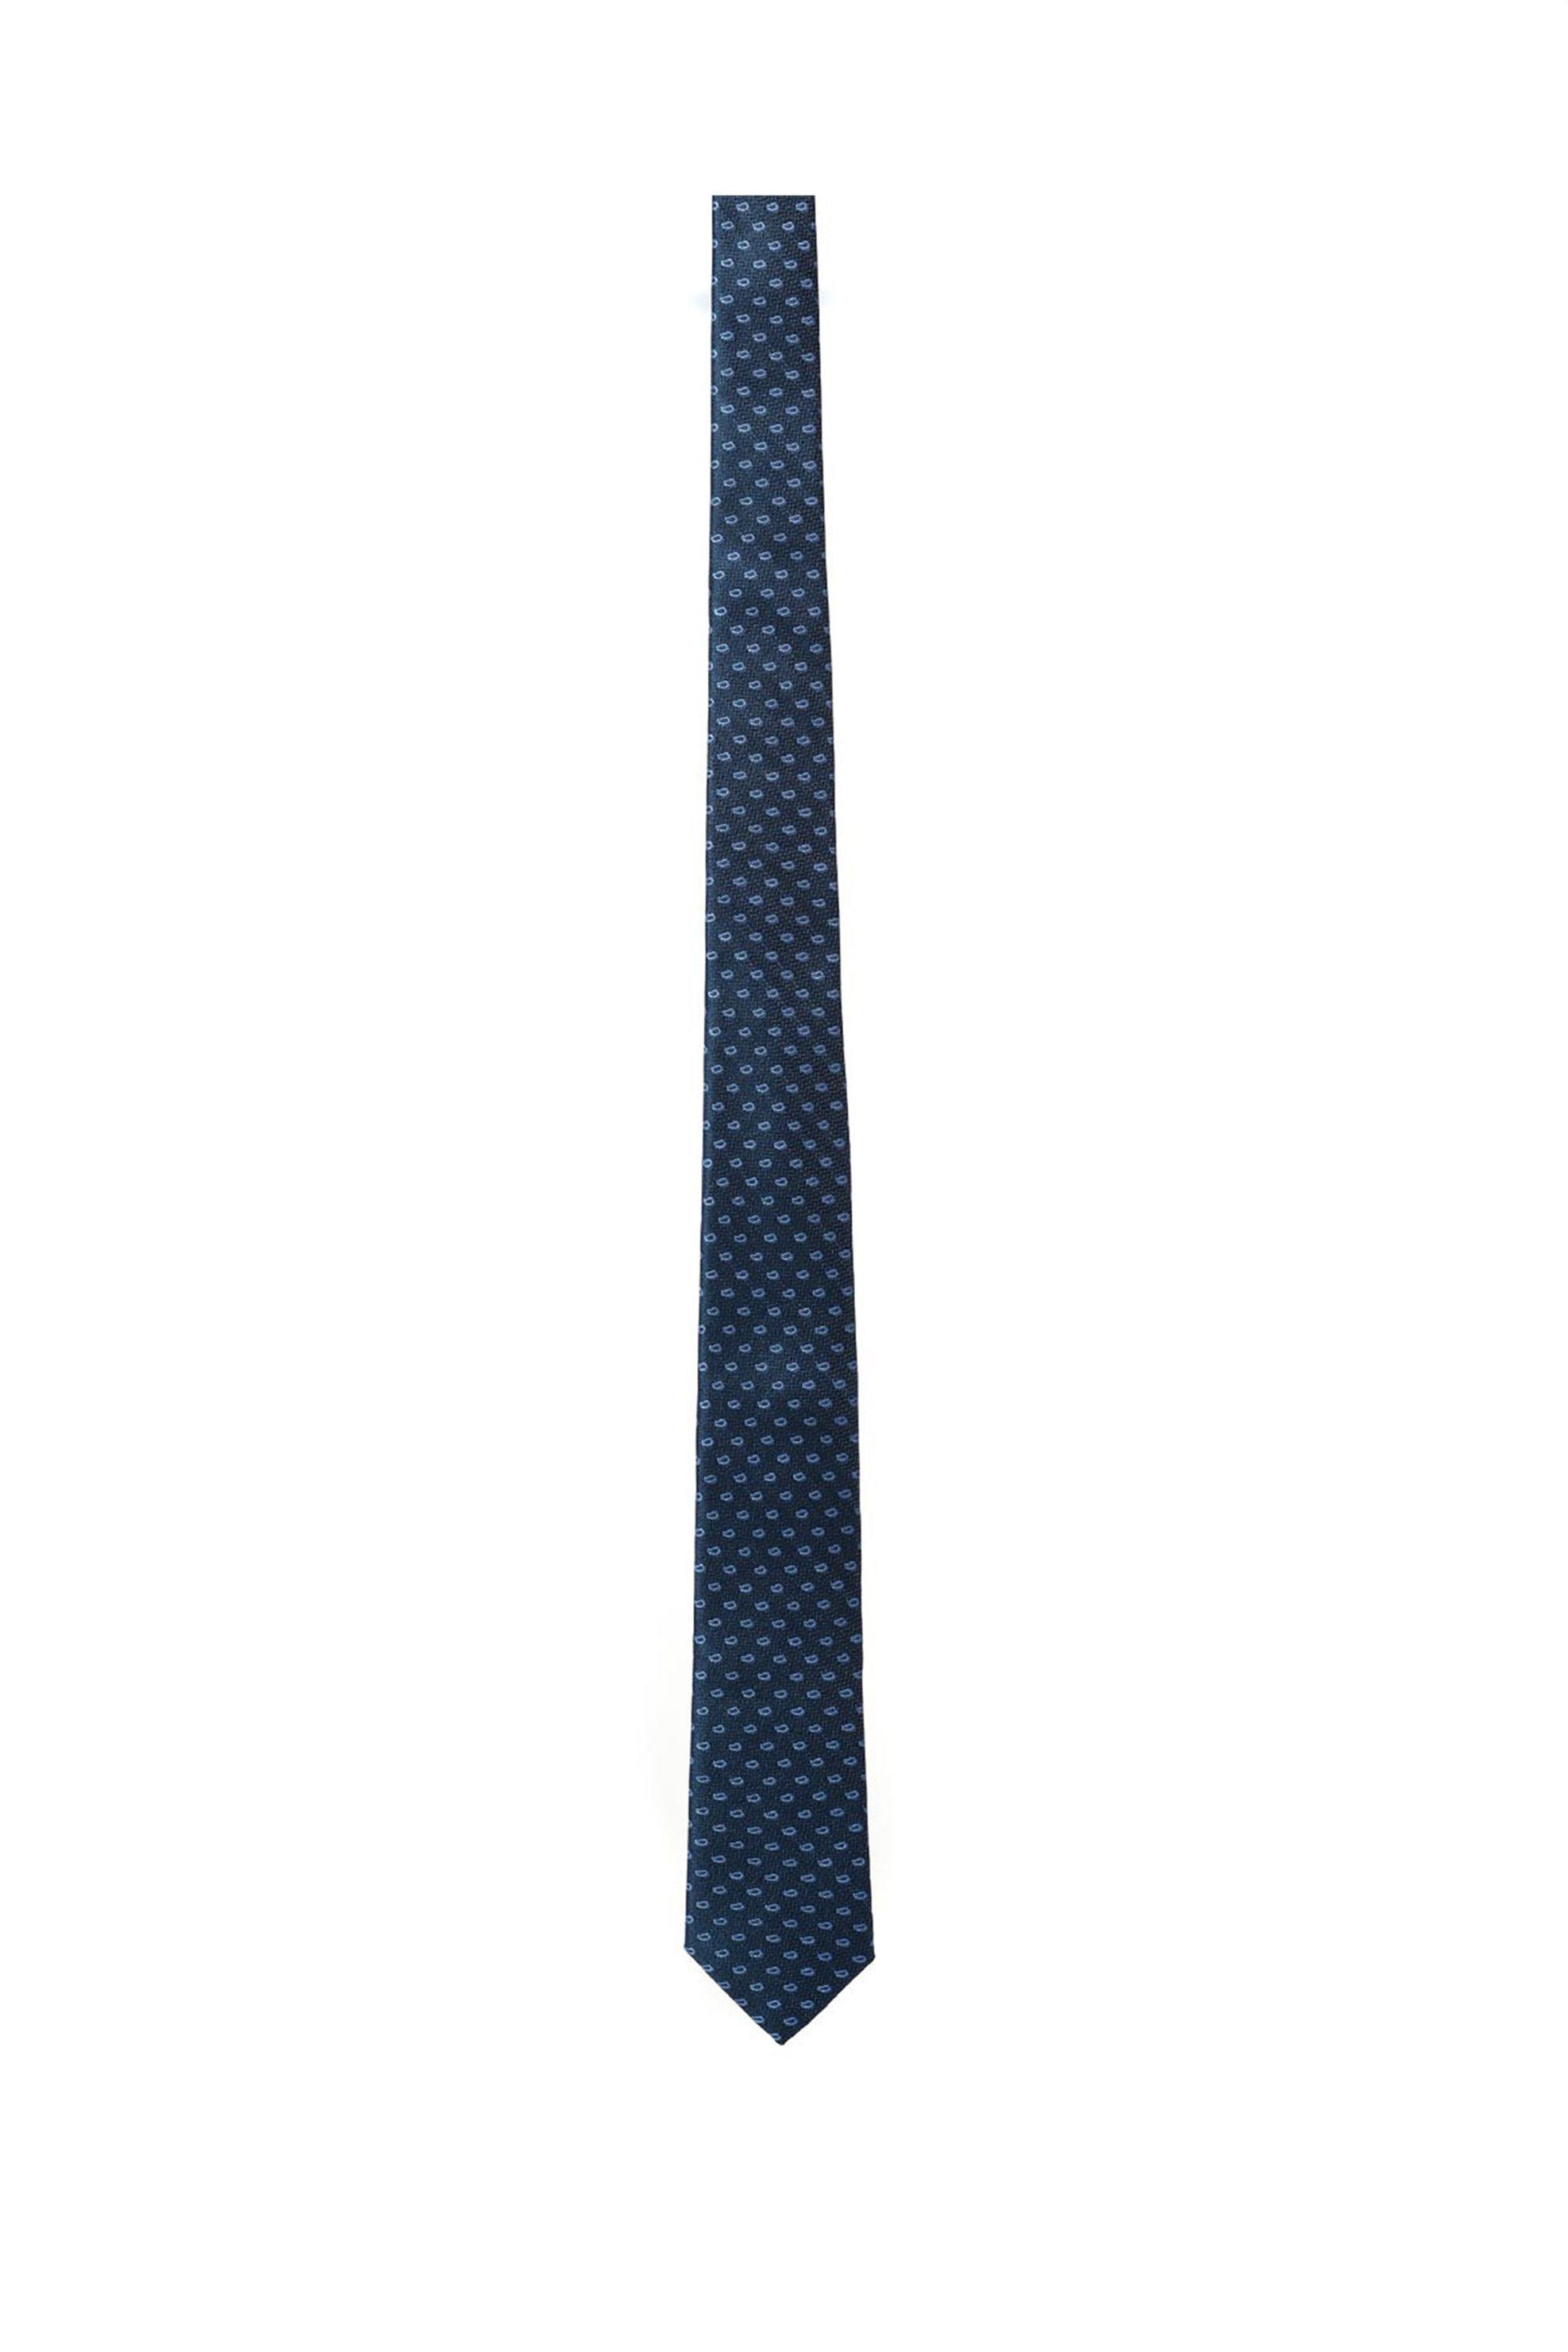 Vardas ανδρική μεταξωτή γραβάτα ''Retro Style Twill'' - 2052005360207 - Μπλε